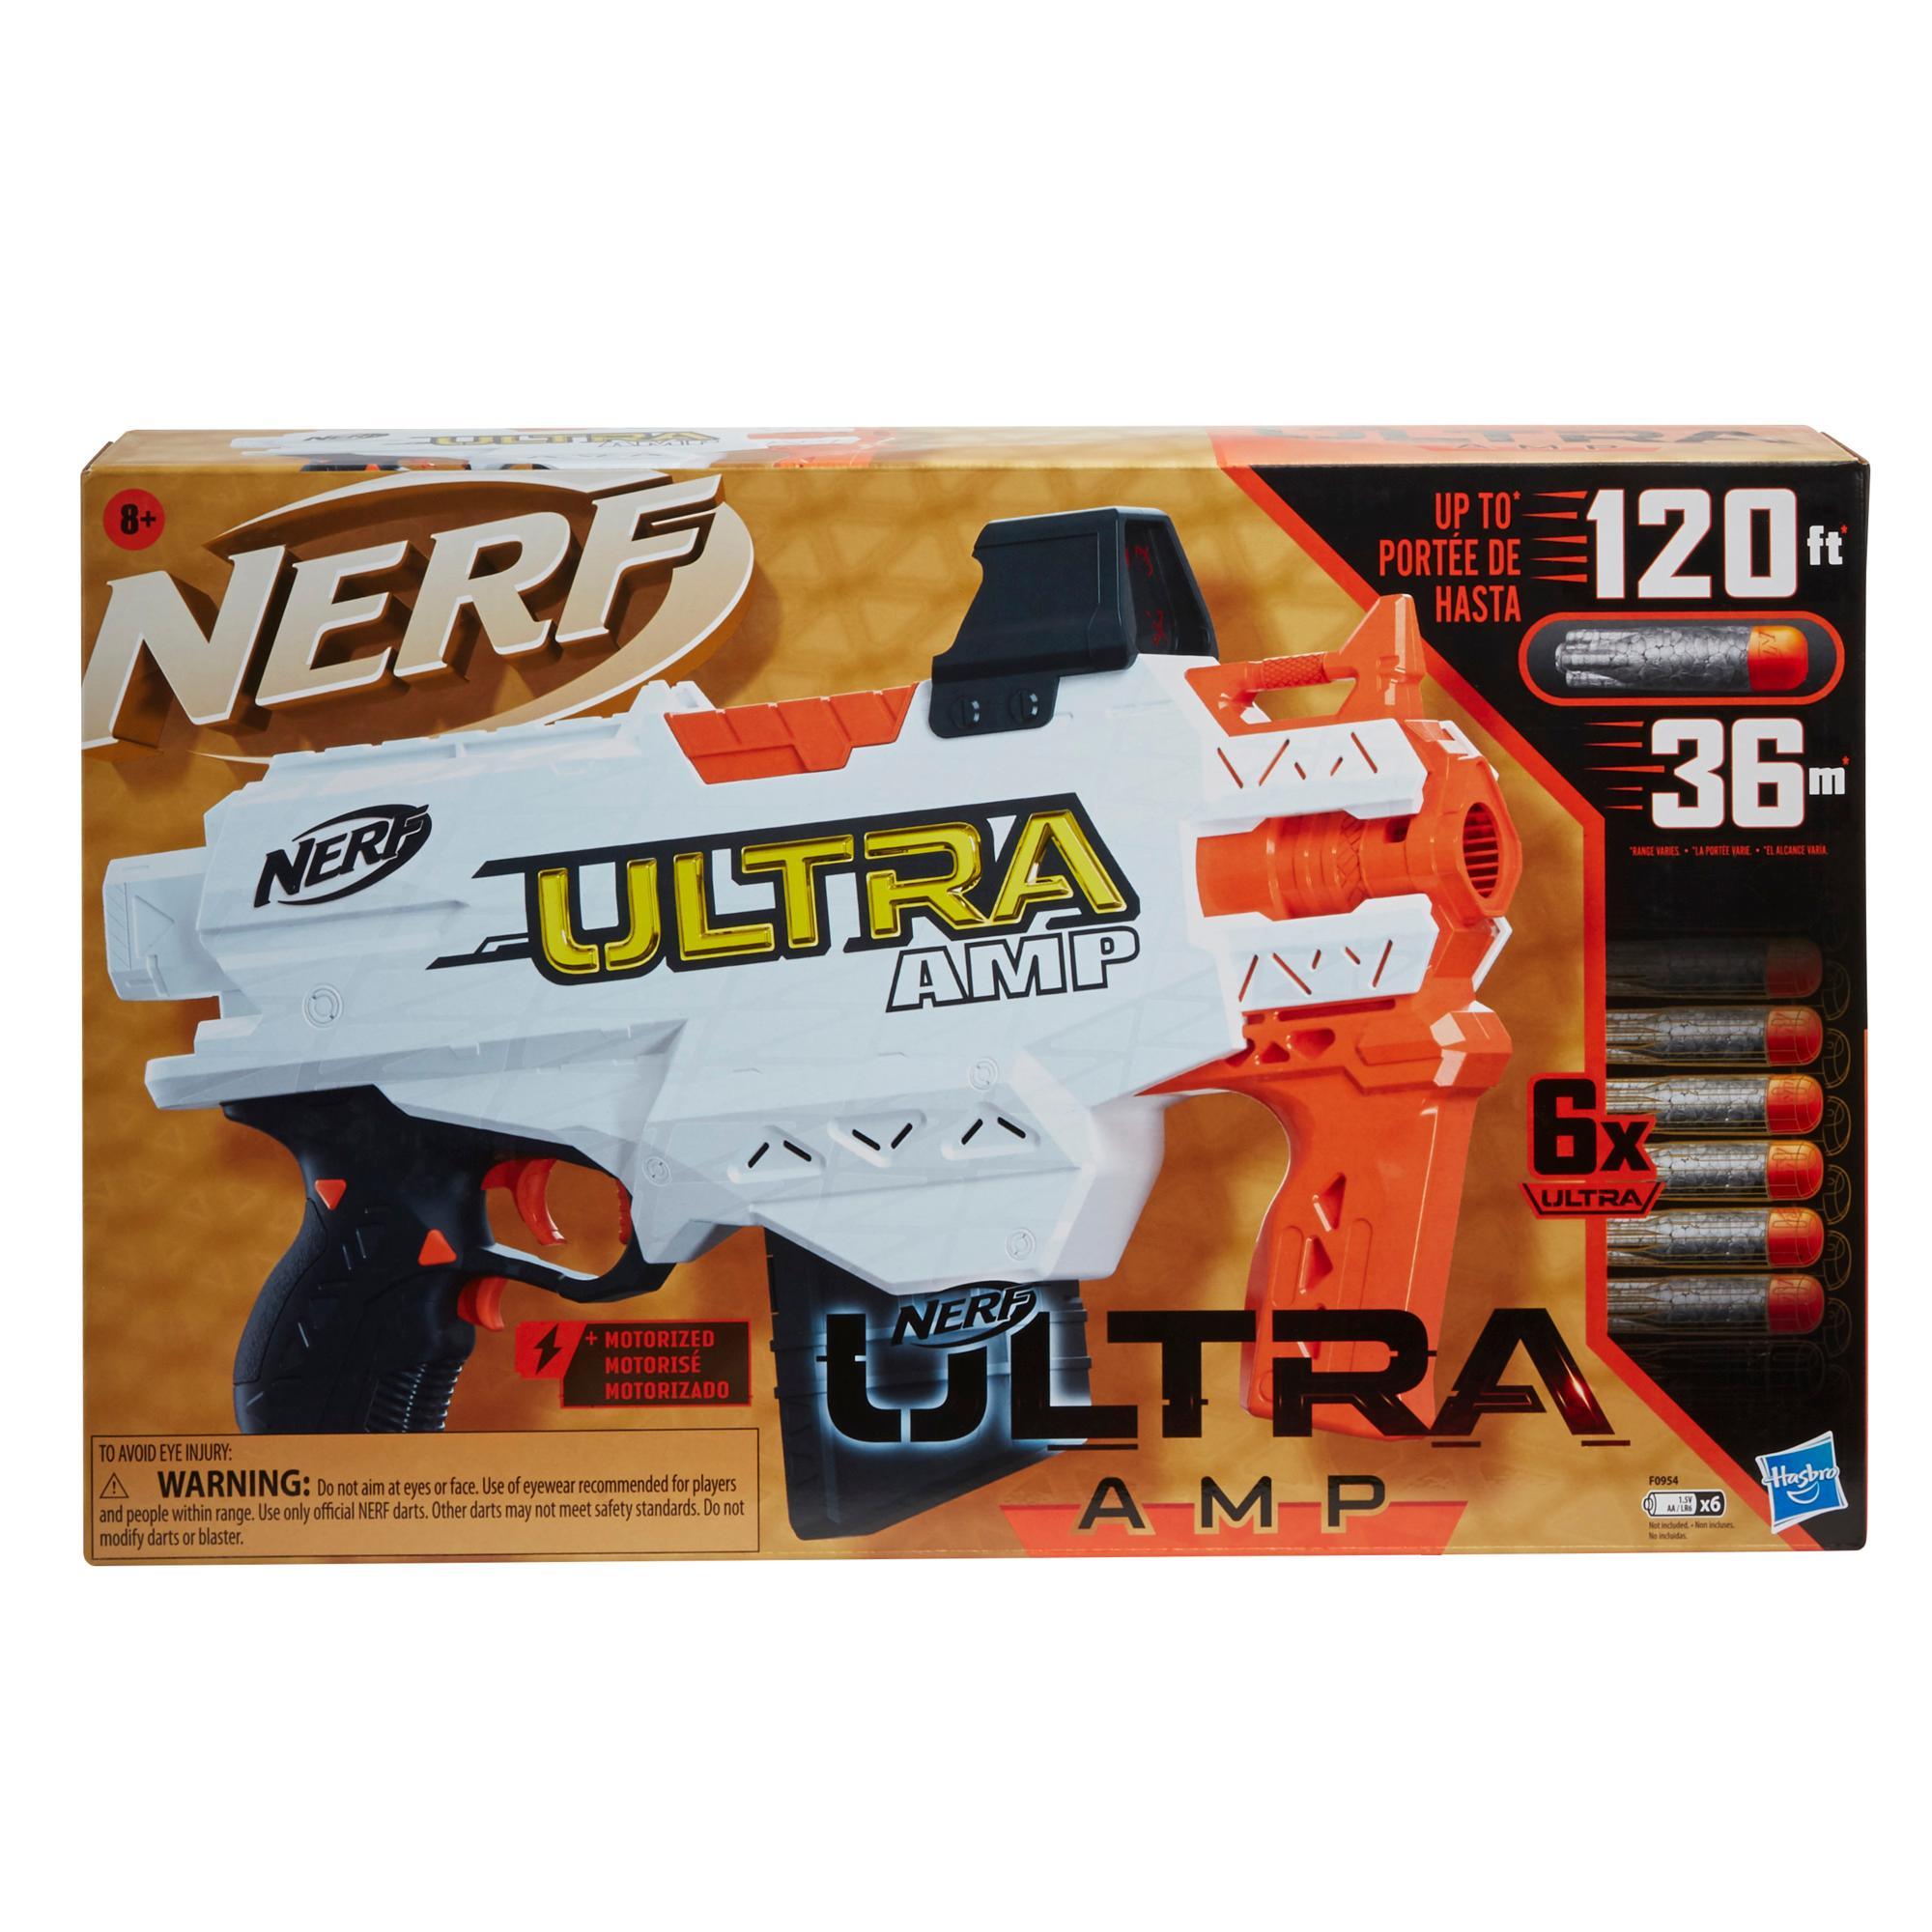 Nerf Ultra Platinum Amp motorisierter Blaster, Platinakzente, 6-Dart Clip, 6 Darts, nur mit Nerf Ultra Darts kompatibel